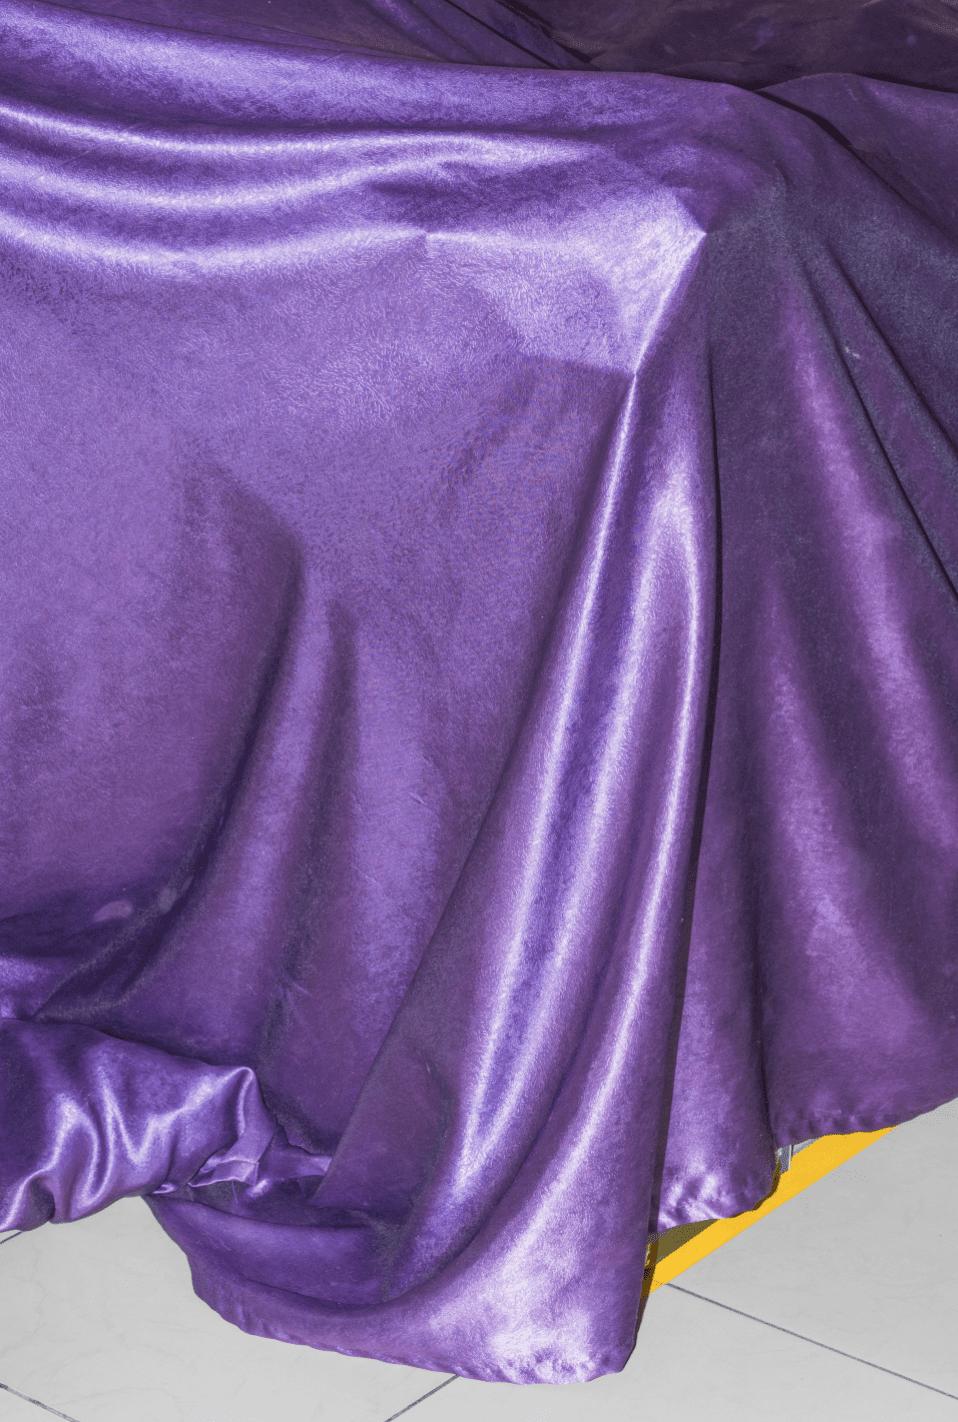 closed-kiosk-purple-15x11